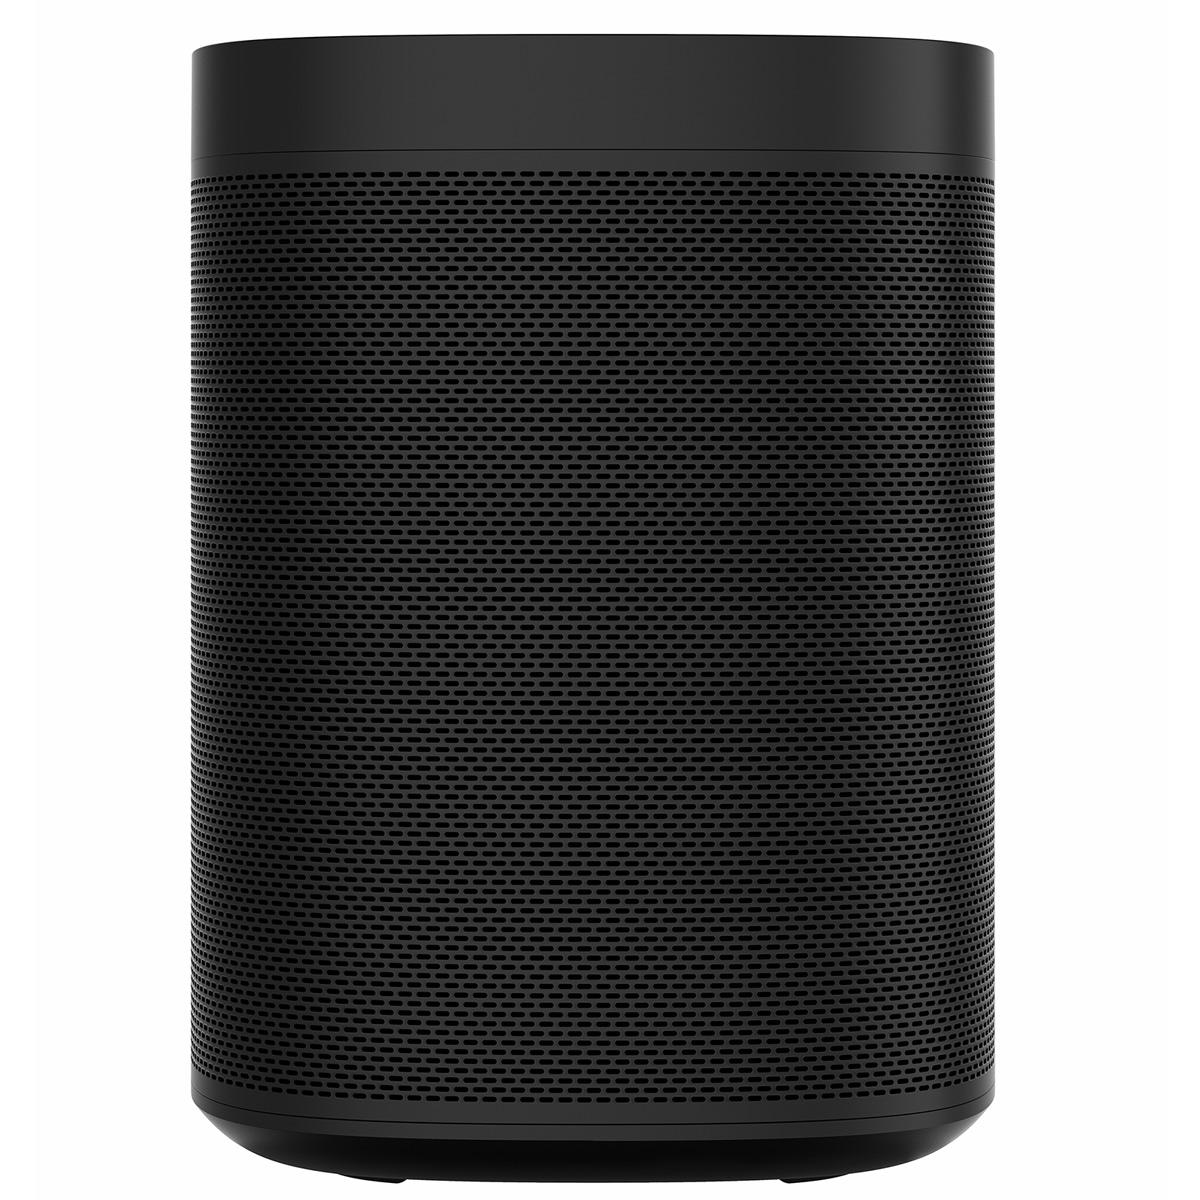 Sonos-One-Voice-Controlled-Wireless-Smart-Speaker-Gen-2 thumbnail 7